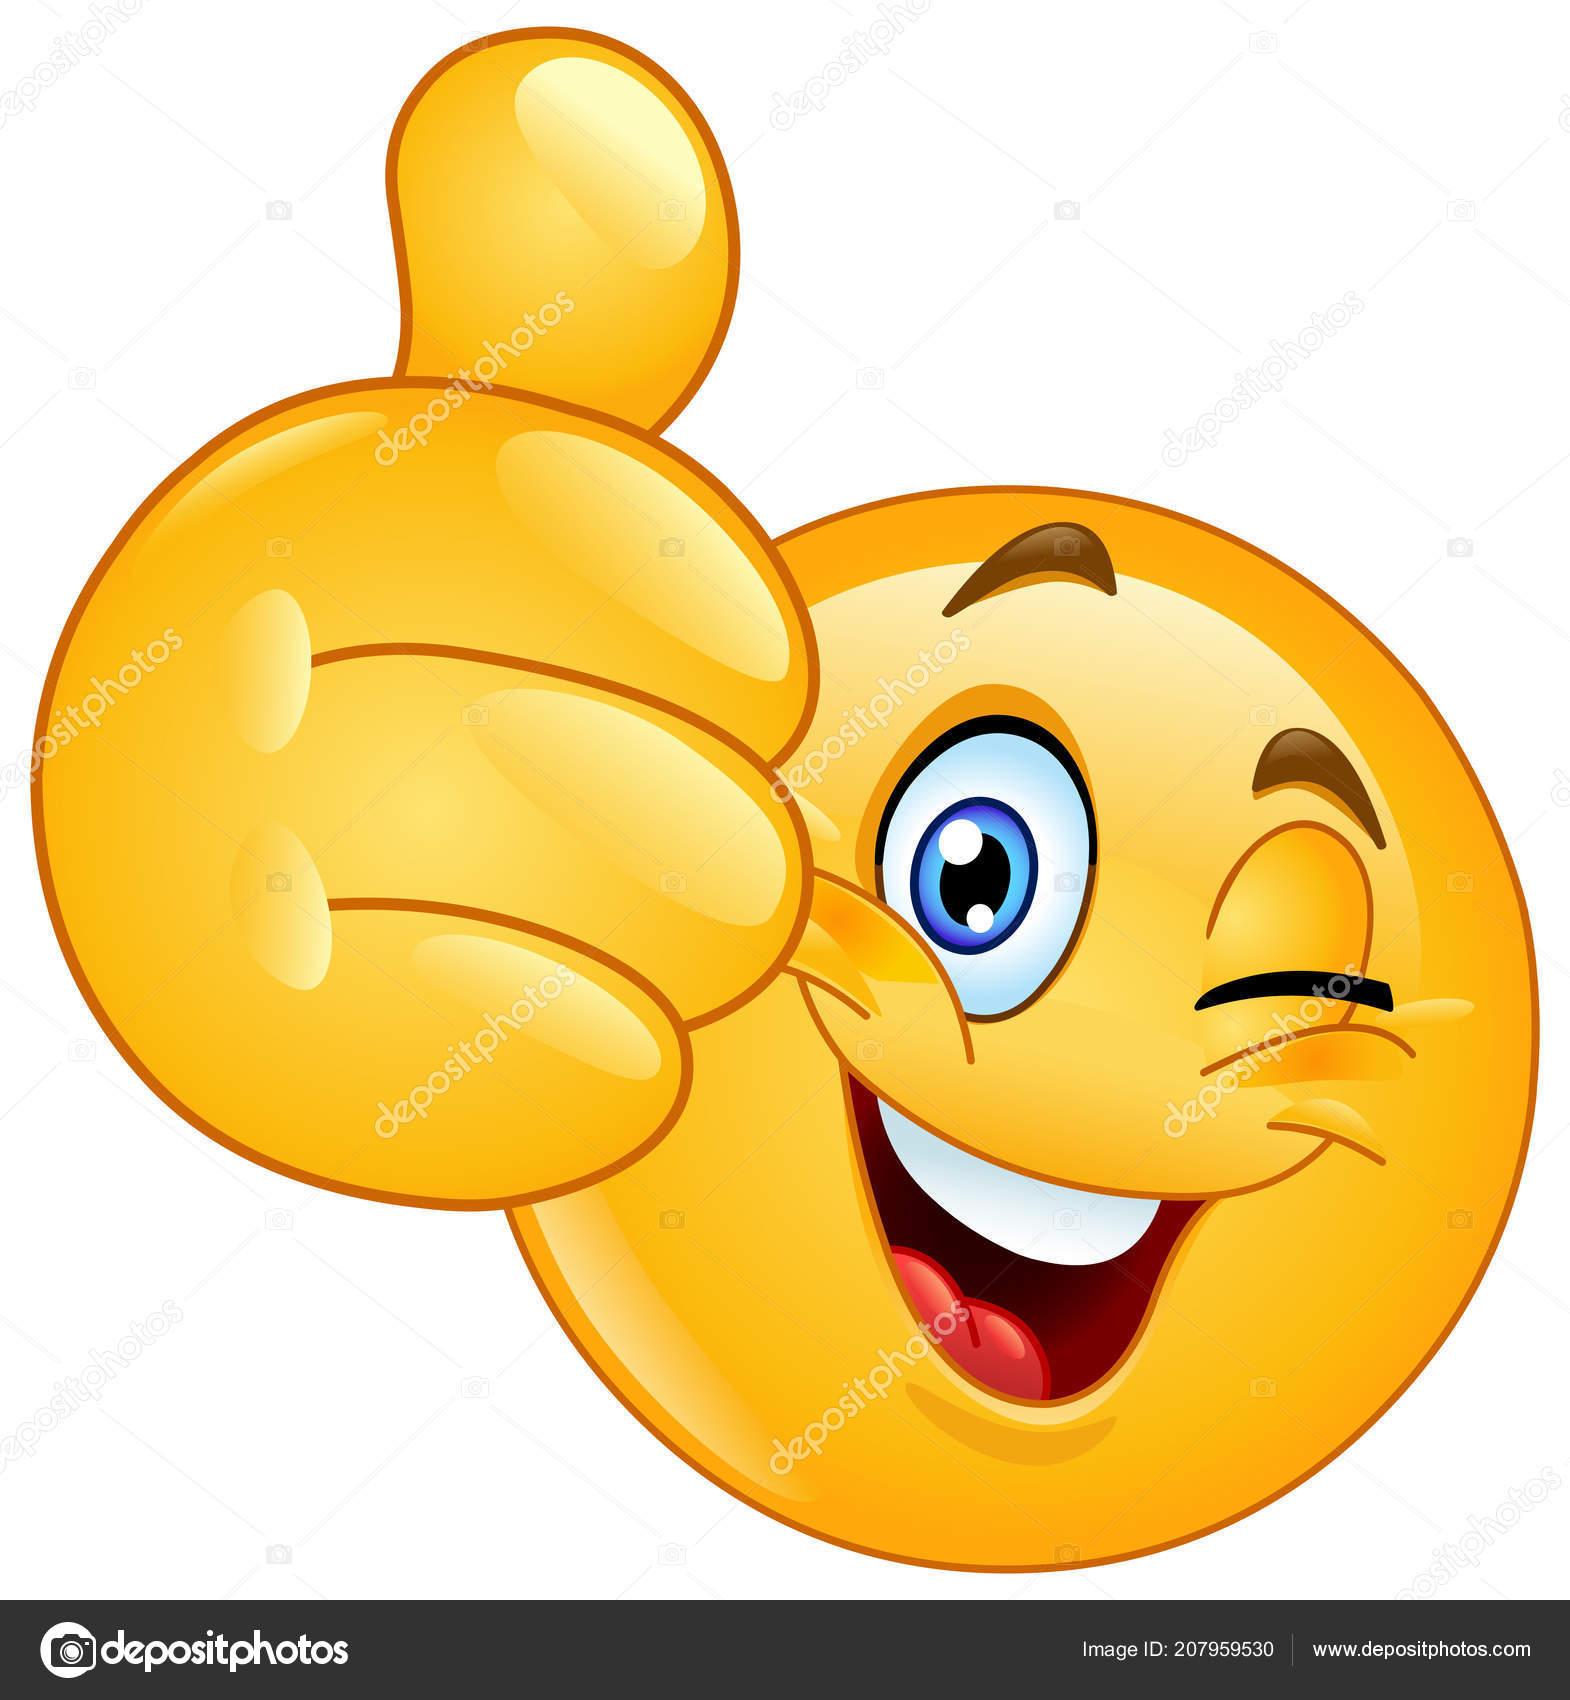 depositphotos_207959530-stock-illustration-emoticon-winking-showing-thumb.jpg